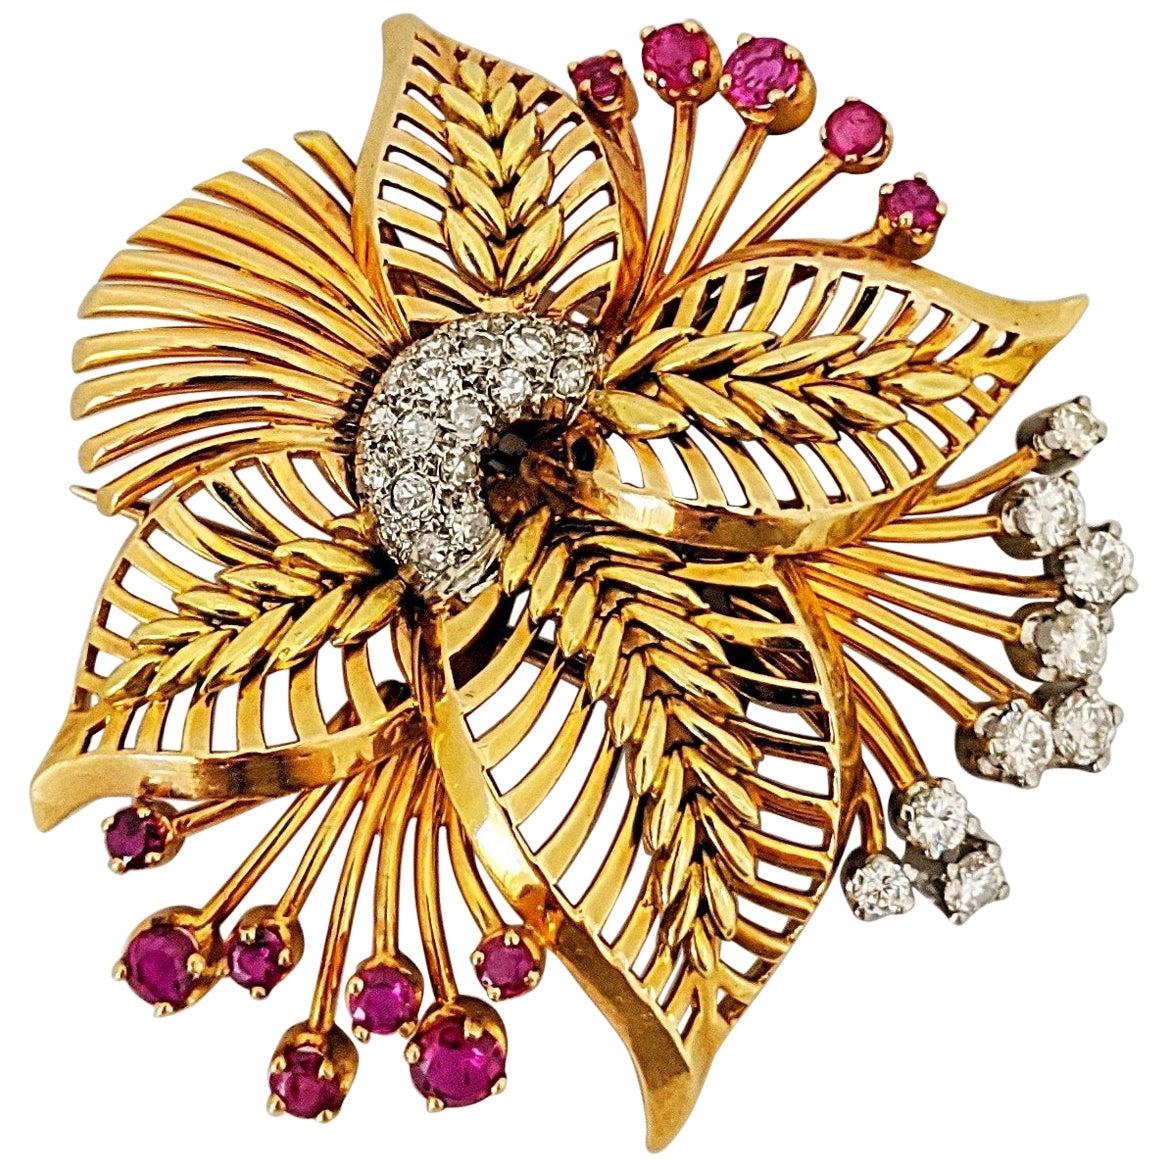 18 Karat Rose Gold Brooch with Diamonds and Rubies, circa 1940s